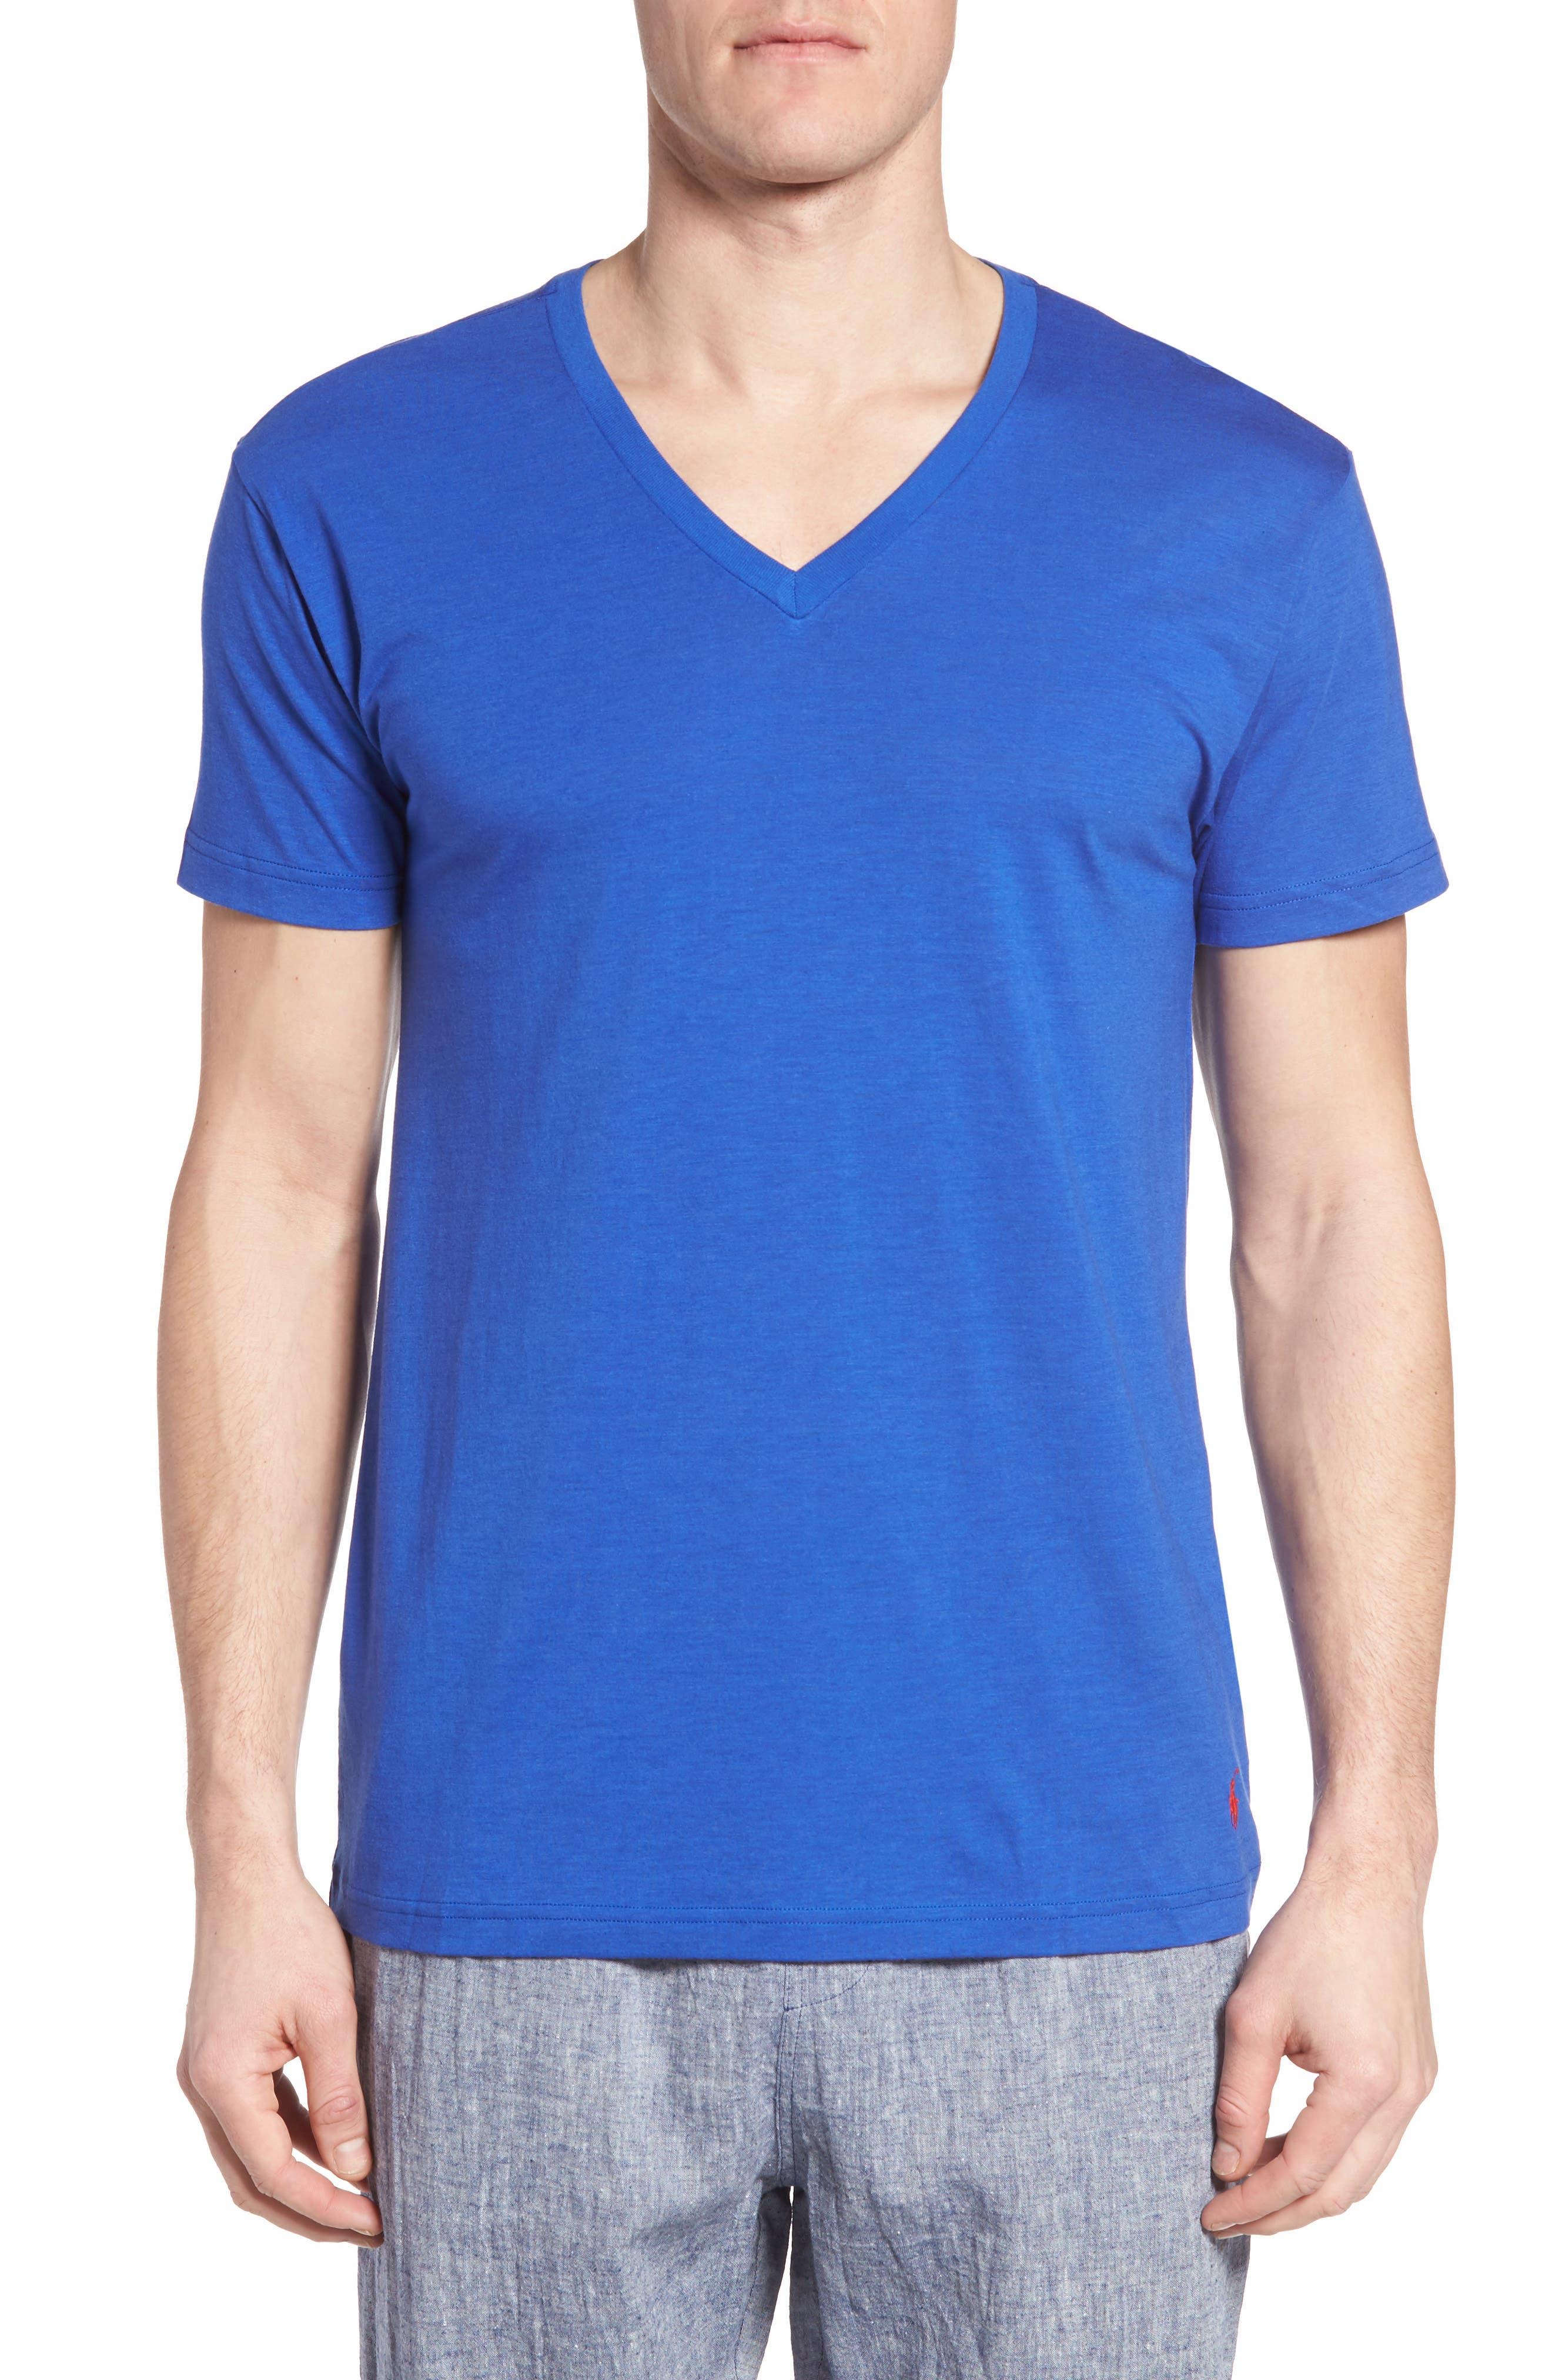 Main Image - Polo Ralph Lauren Lounge V-Neck T-Shirt